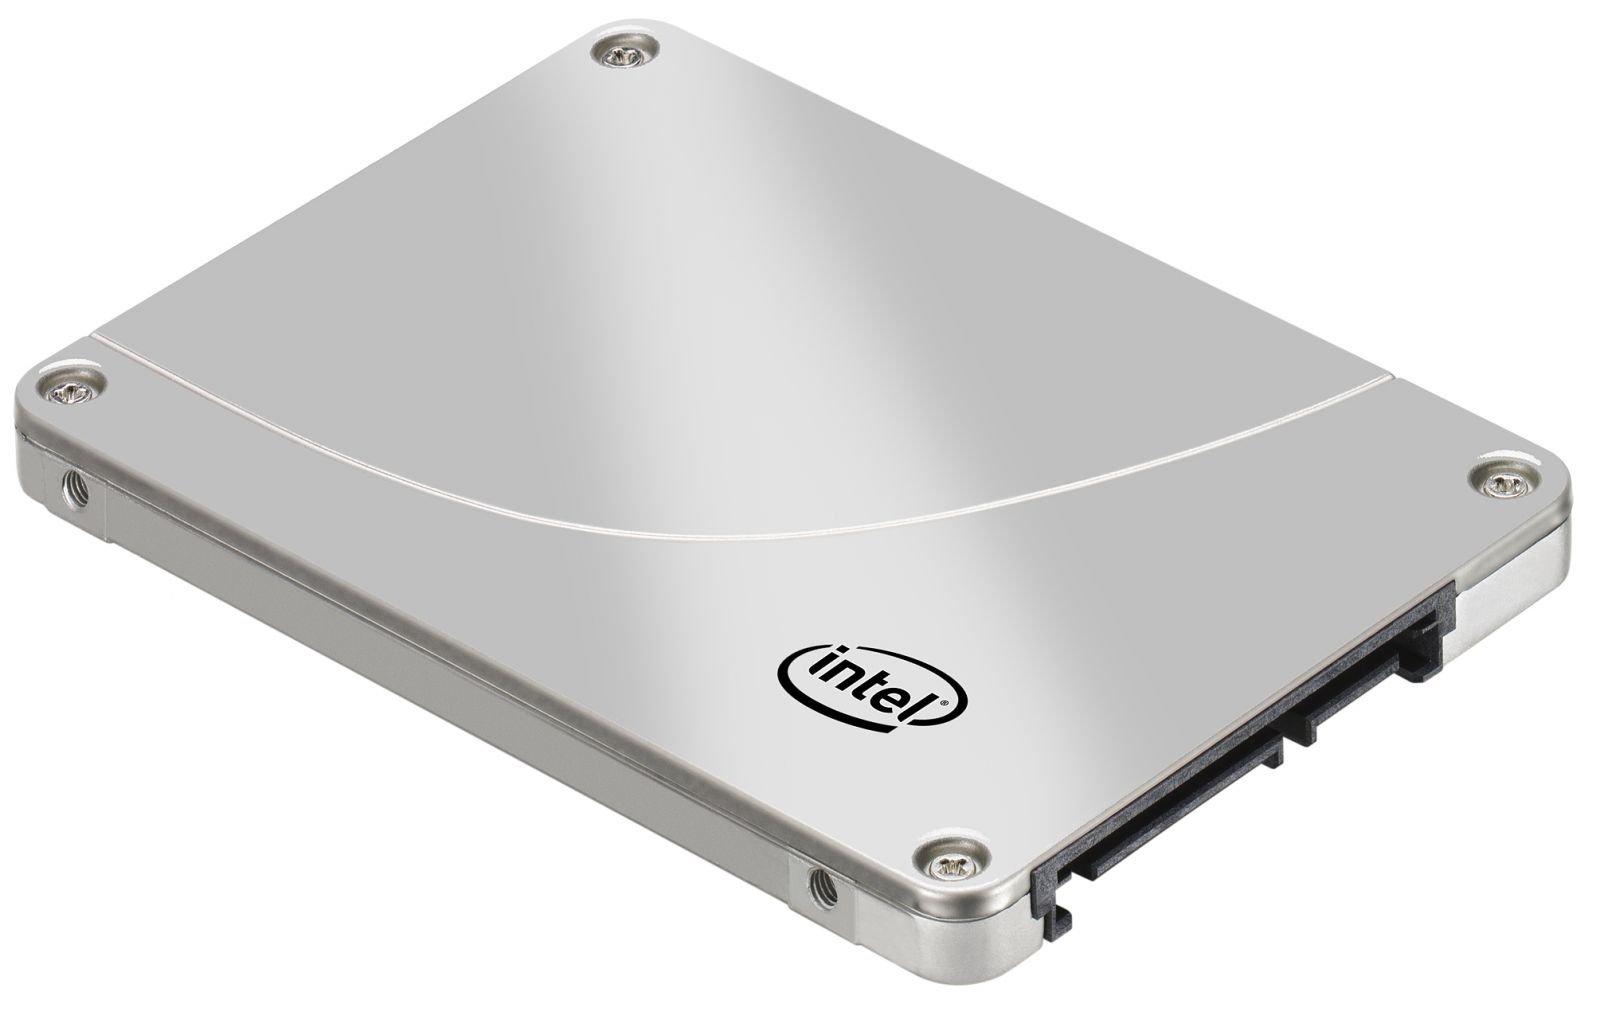 SSD 300GB SATA Intel 320 Series 300GB SA1NW300G301 1.8 Micro